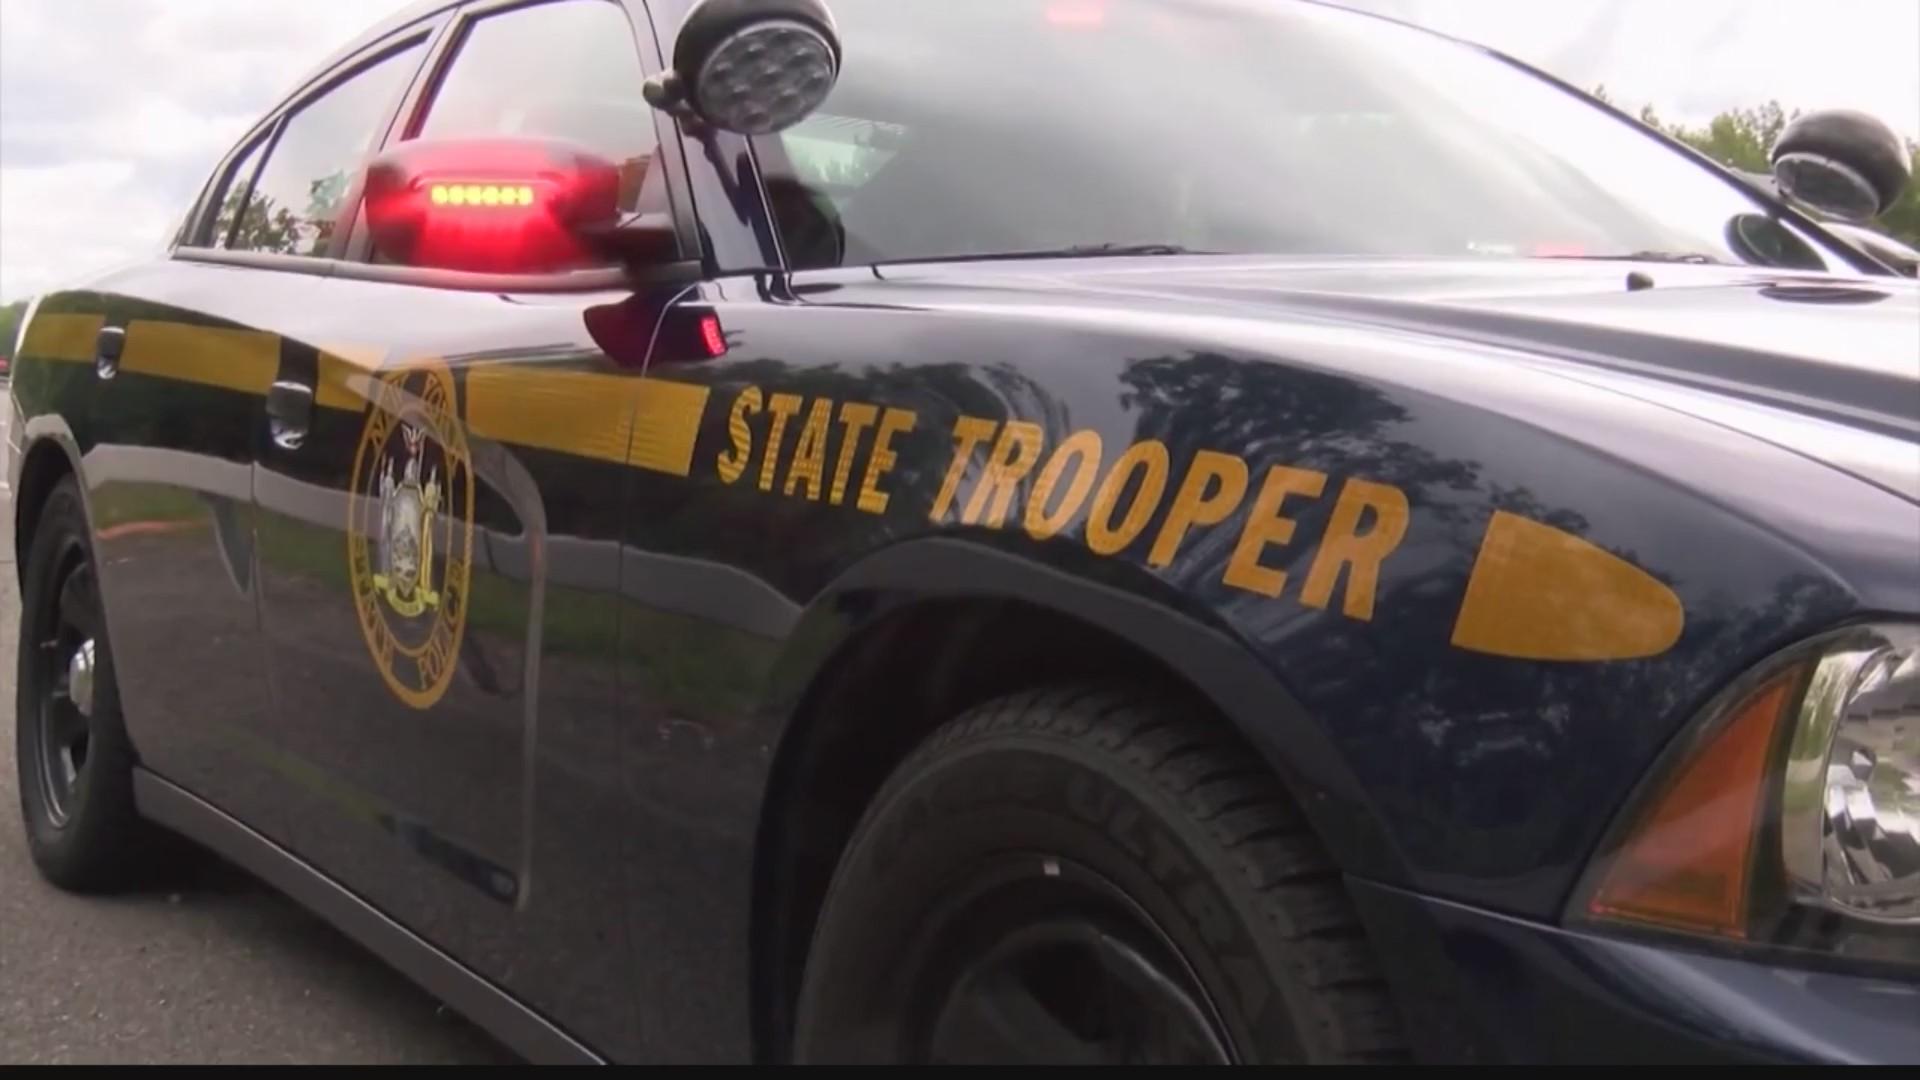 New York State Trooper patrol car. (file photo)